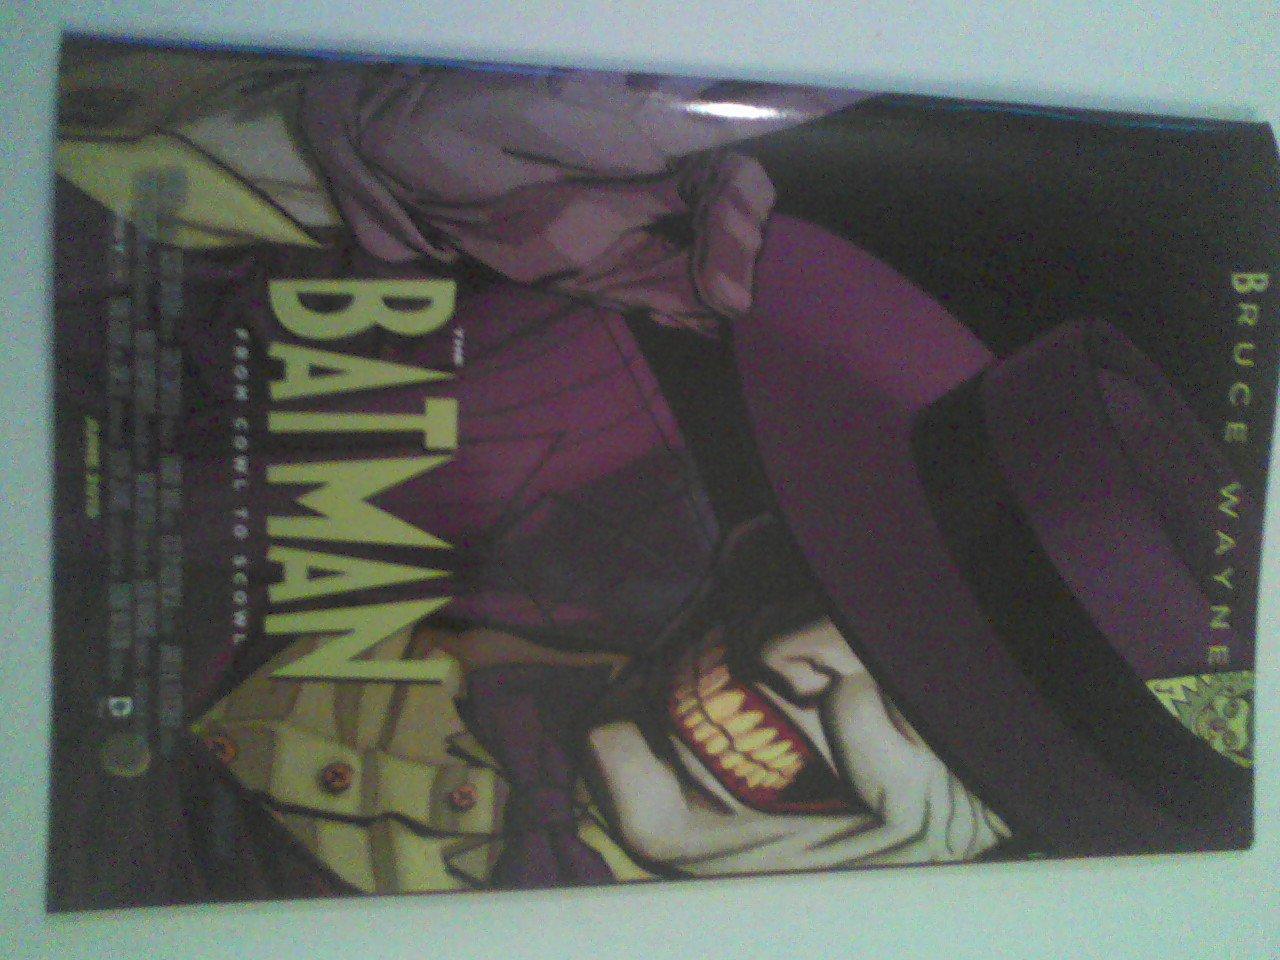 Batman Vol 2 #35 The New 52 Monster Variant #40 Movie Variant